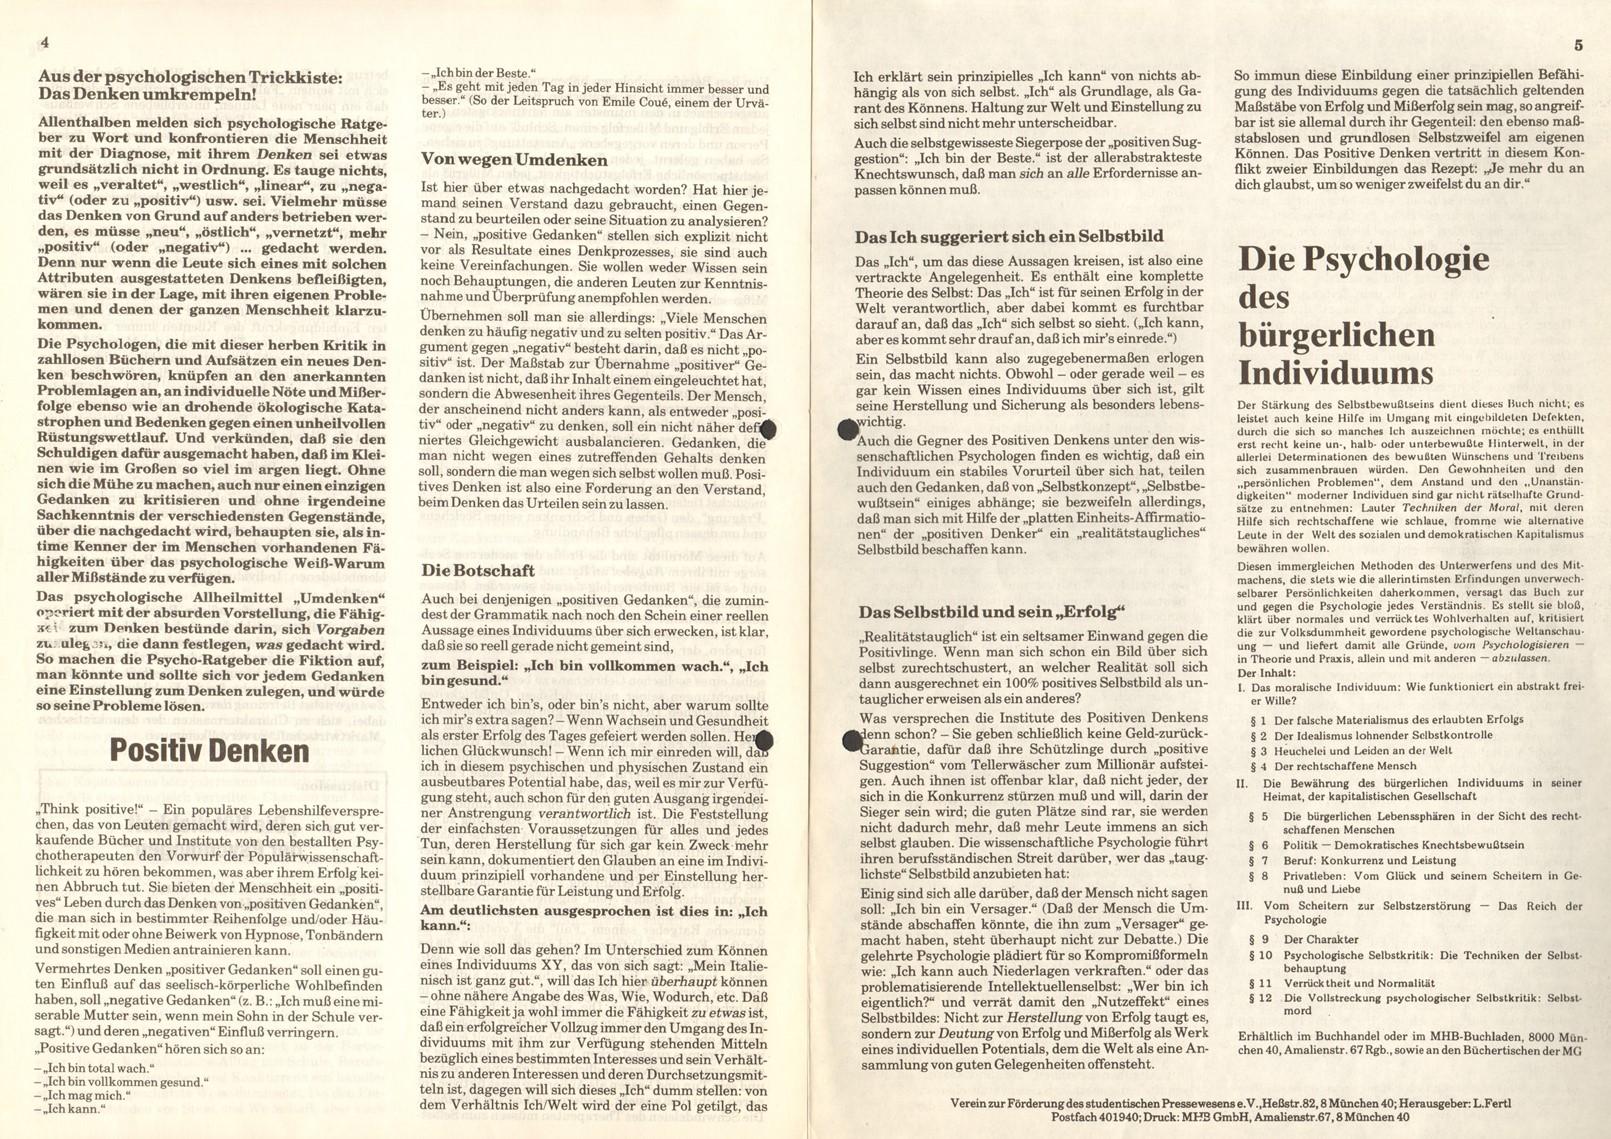 Muenchen_MG_FB_Psychologie_19890200_03